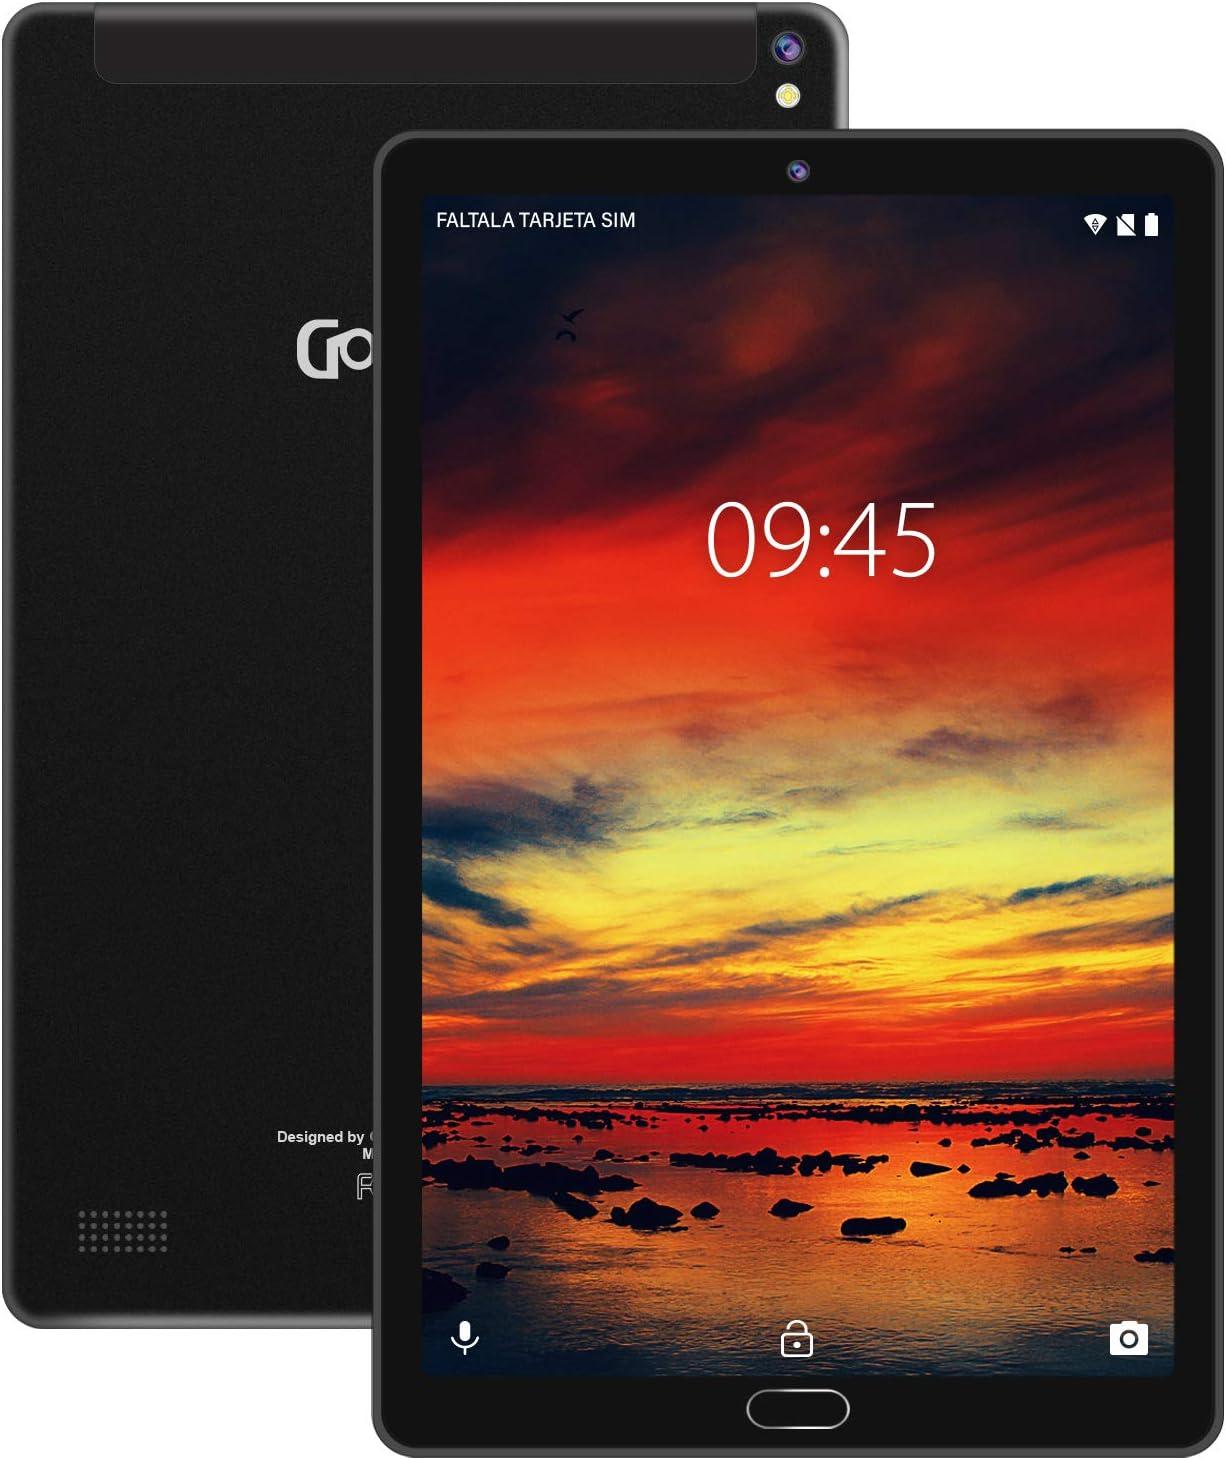 Tablet 10 Pulgadas Tablet Full HD Phablet con Ranuras para Tarjetas SIM Dobles Procesador de Cuatro Núcleos, 3G + 32GB, Doble Cámara Dobles SIM Tablet,WI-FI,GPS,Bluetooth Type-C Tablets